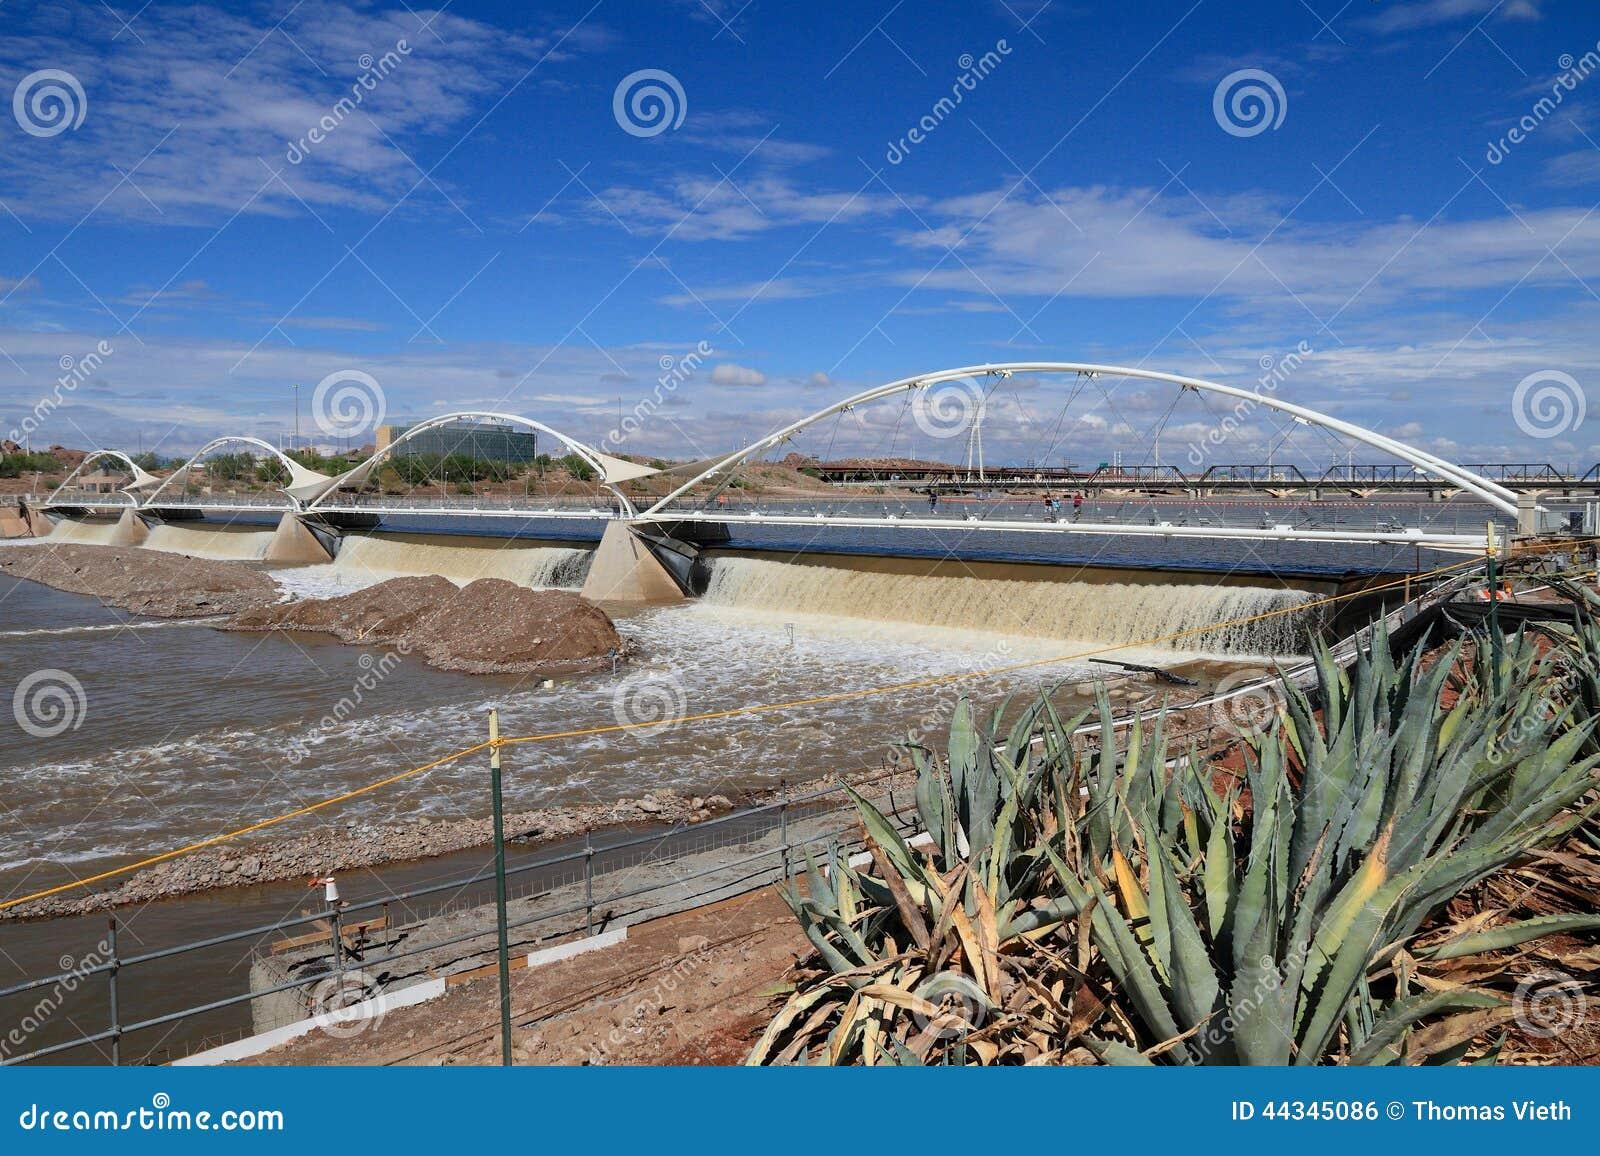 USA, AZ/Tempe: Historic Salt River Dam After Heavy Rains